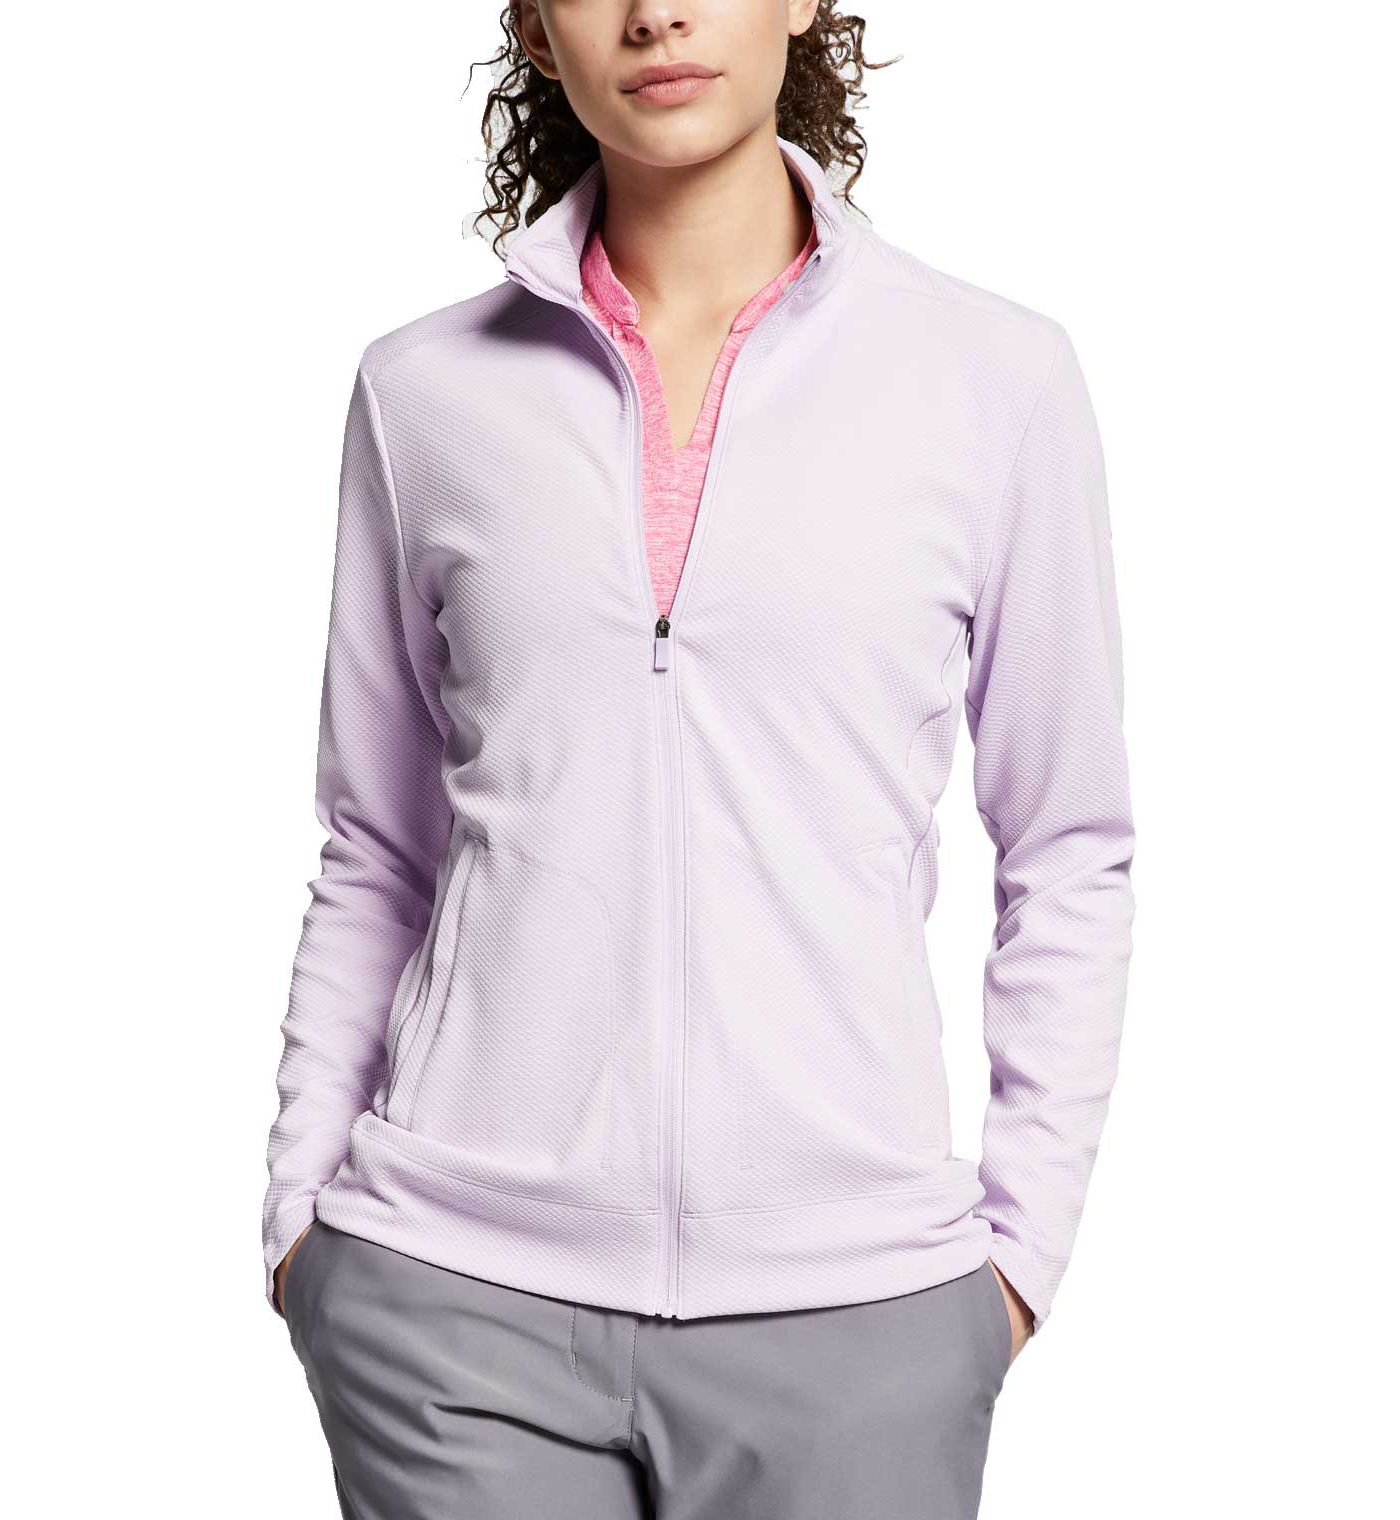 Nike Women's Dri-FIT Full-Zip Golf Jacket